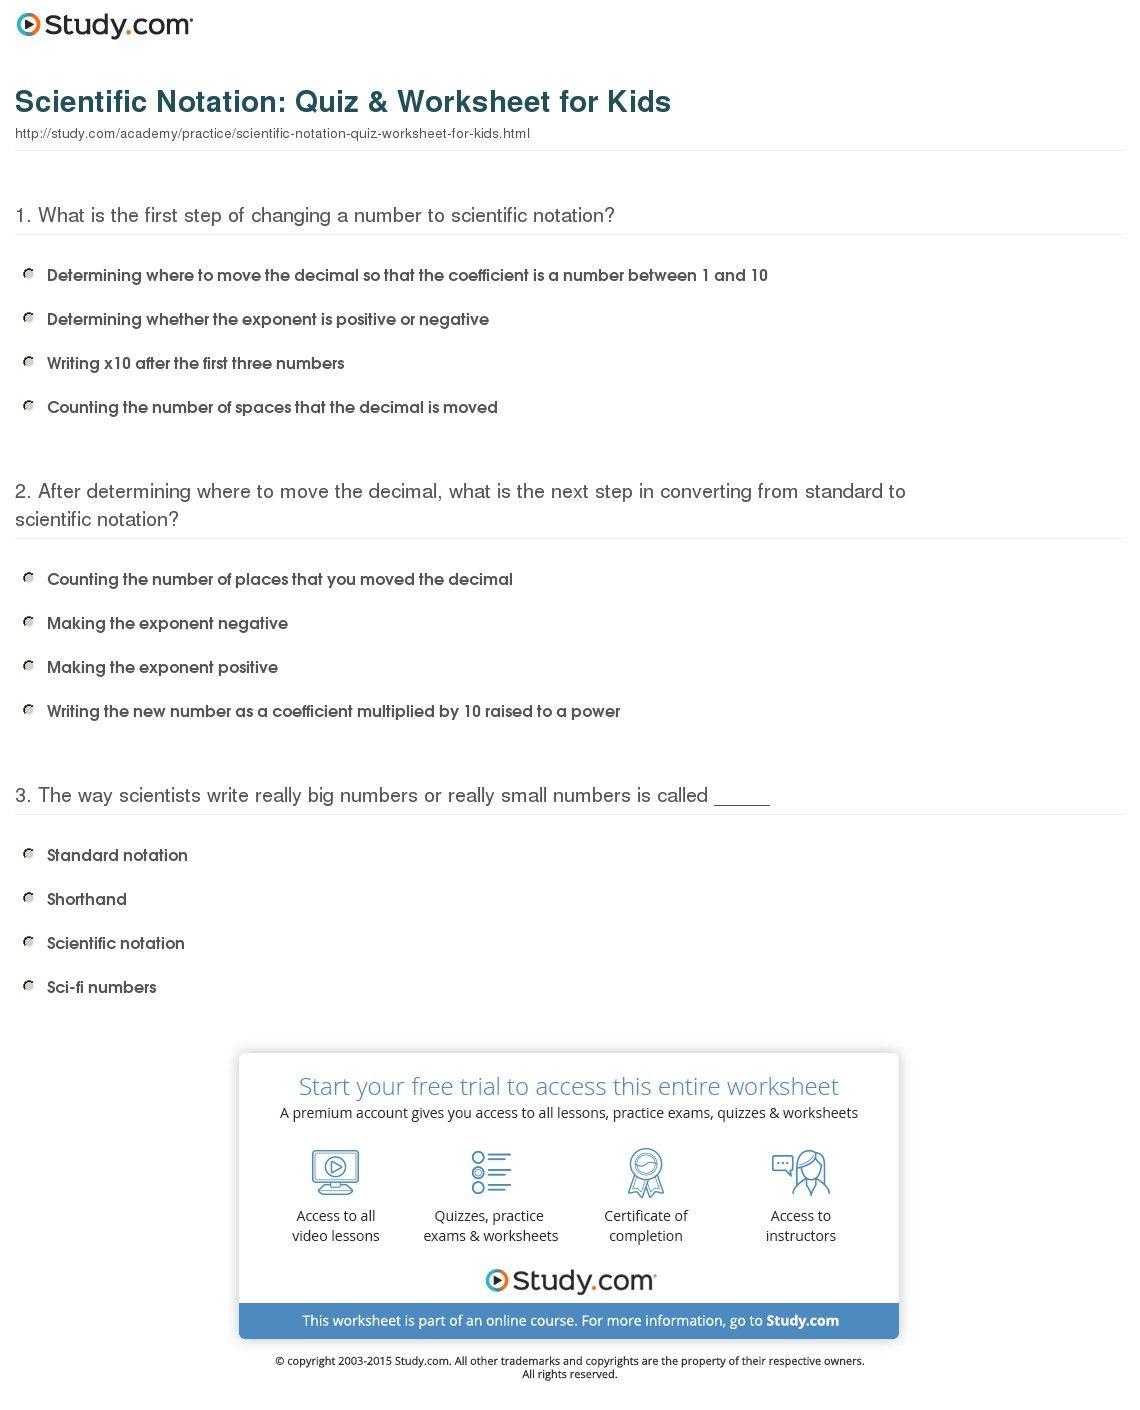 42 Clever Scientific Notation Worksheet Ideas